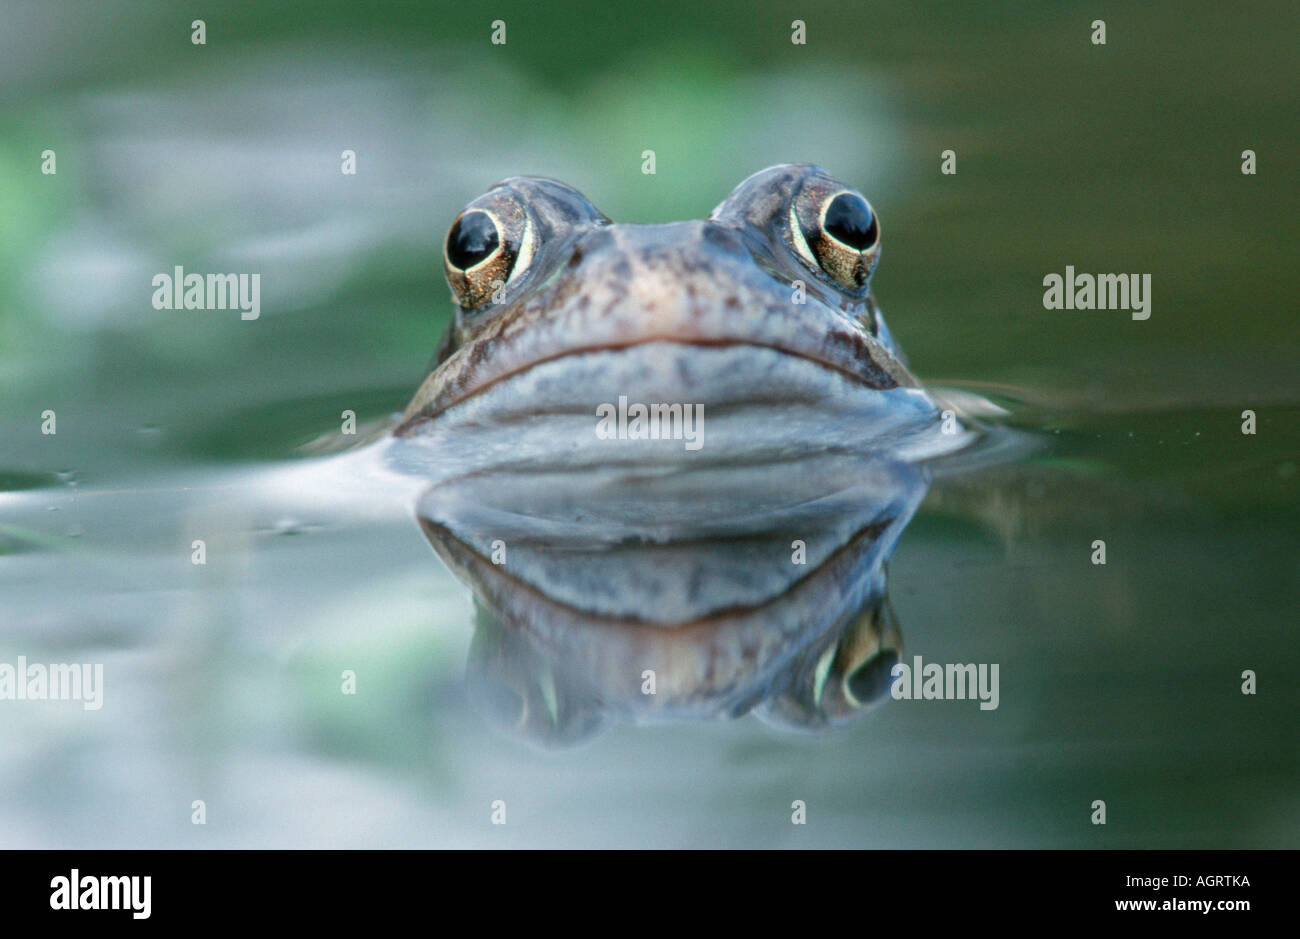 Common European Frog Stock Photo